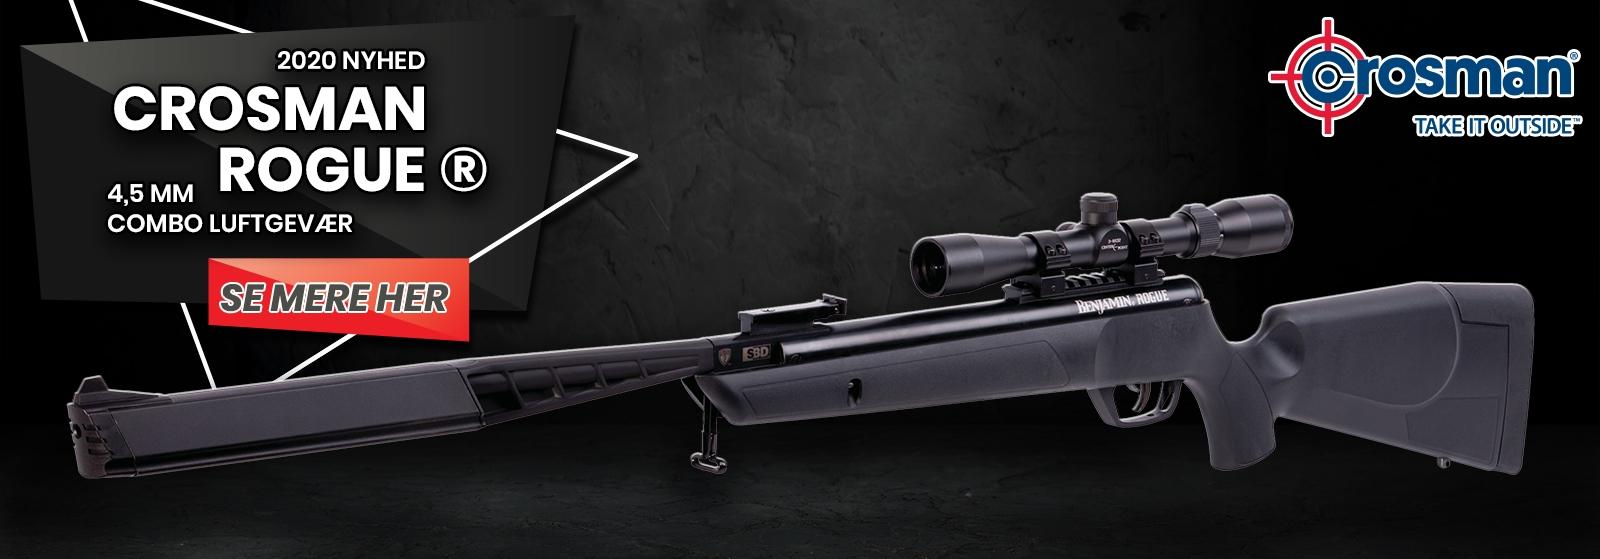 Crosman Rogue® Combo luftgevær